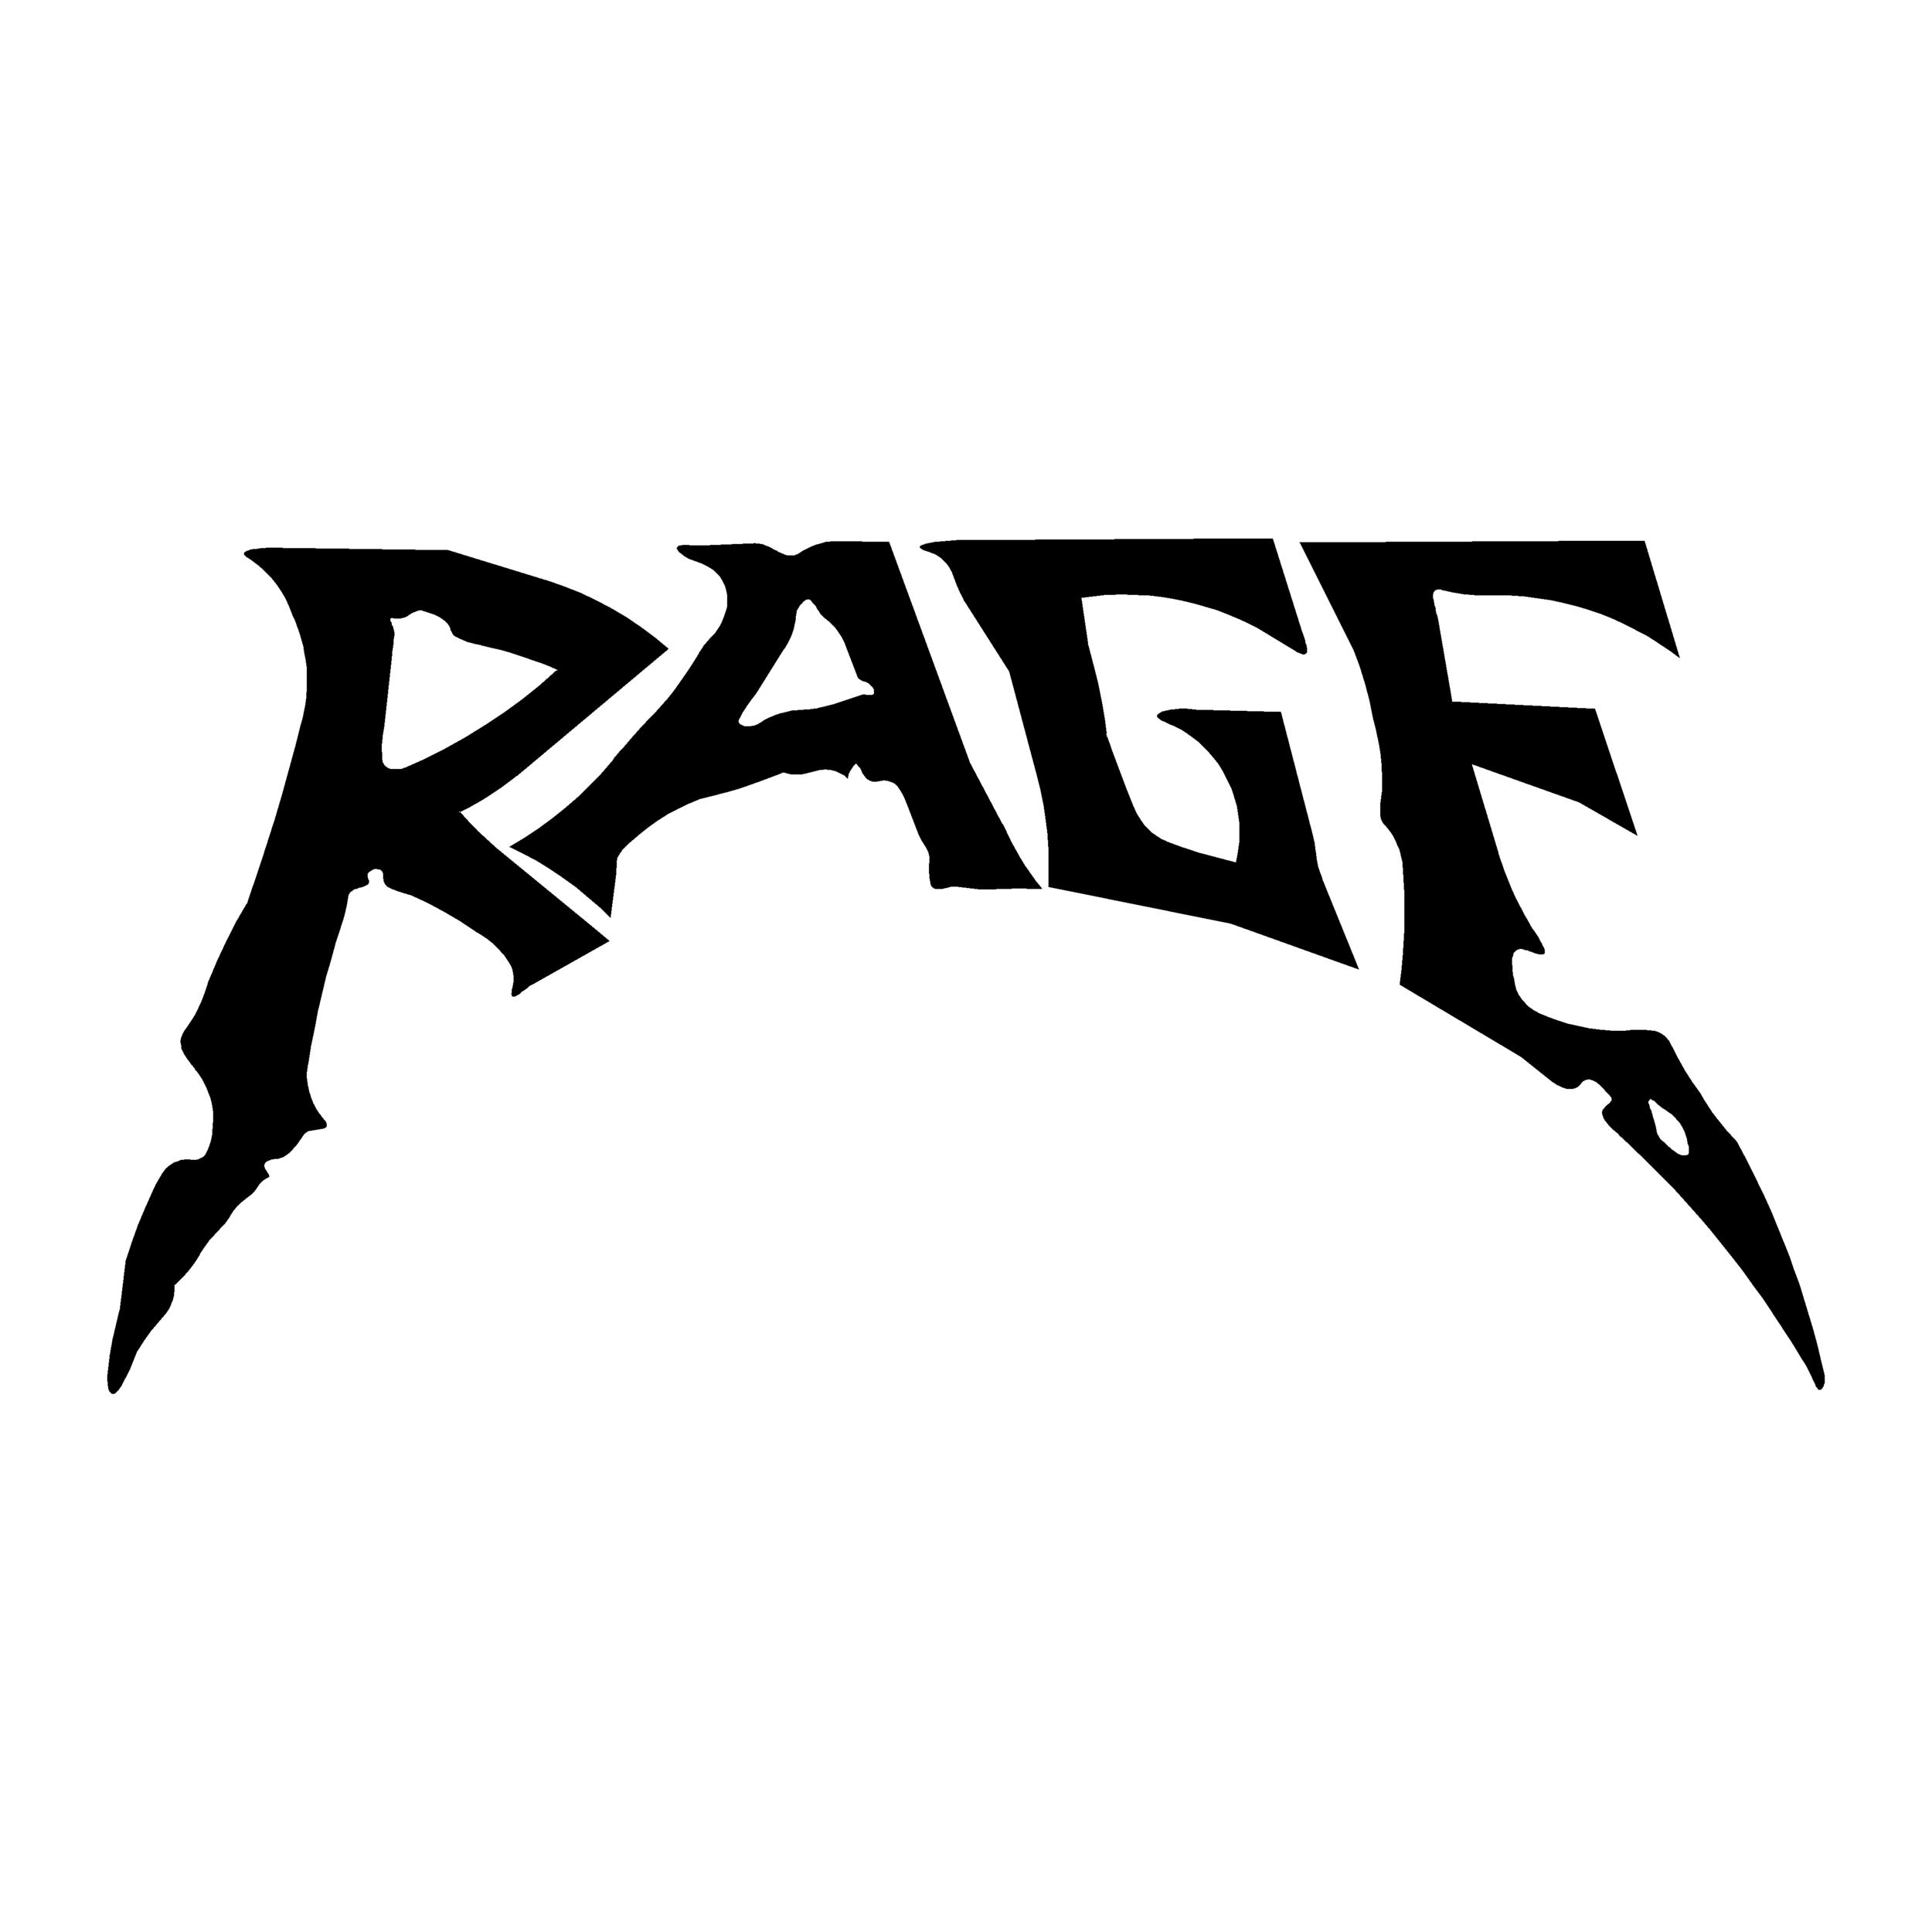 stickers rage ref 1 tuning audio sonorisation car auto moto camion competition deco rallye autocollant